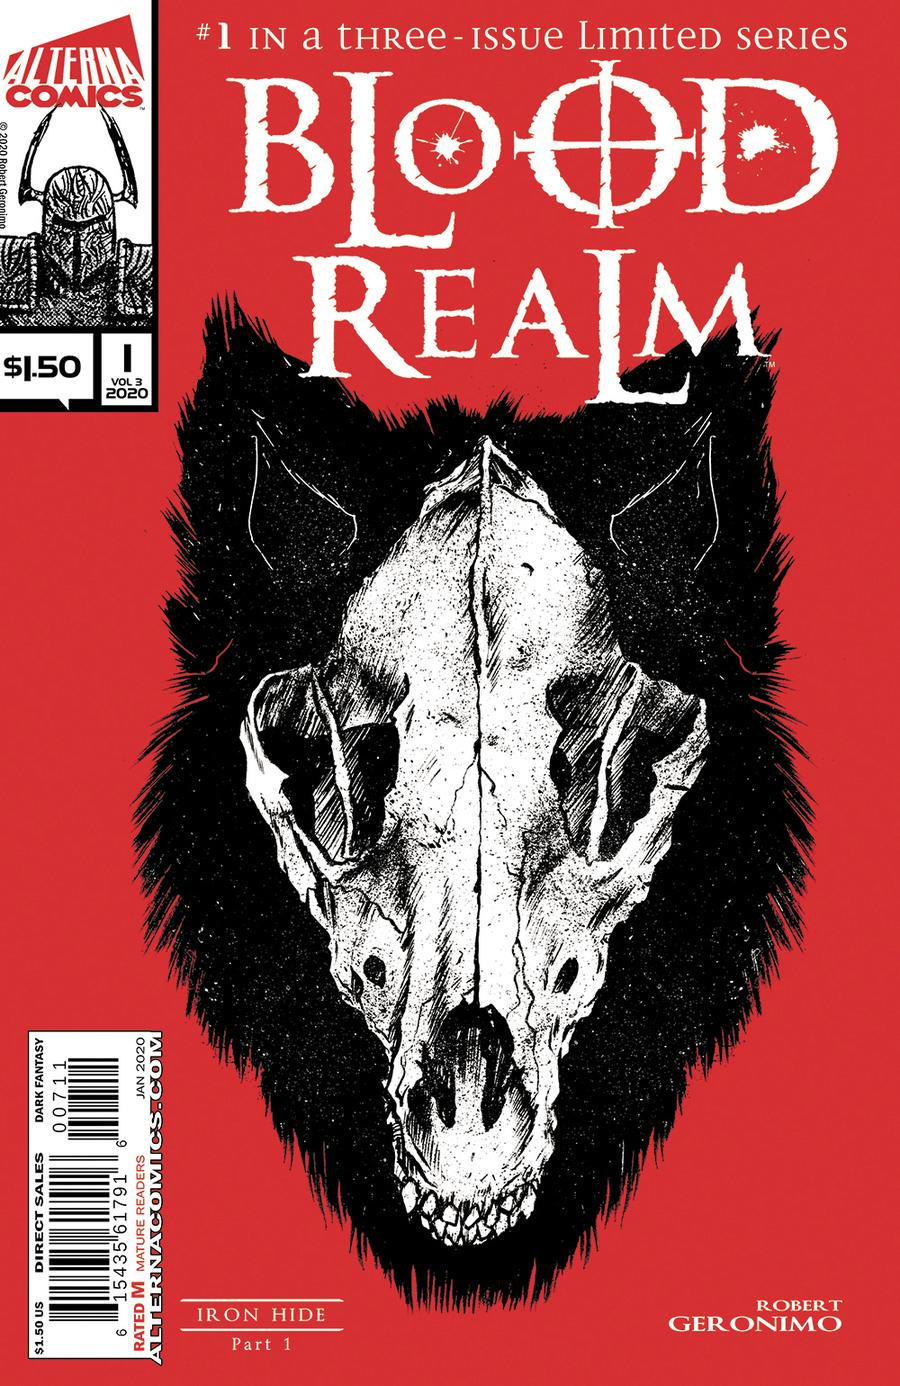 Blood Realm Vol 3 #1